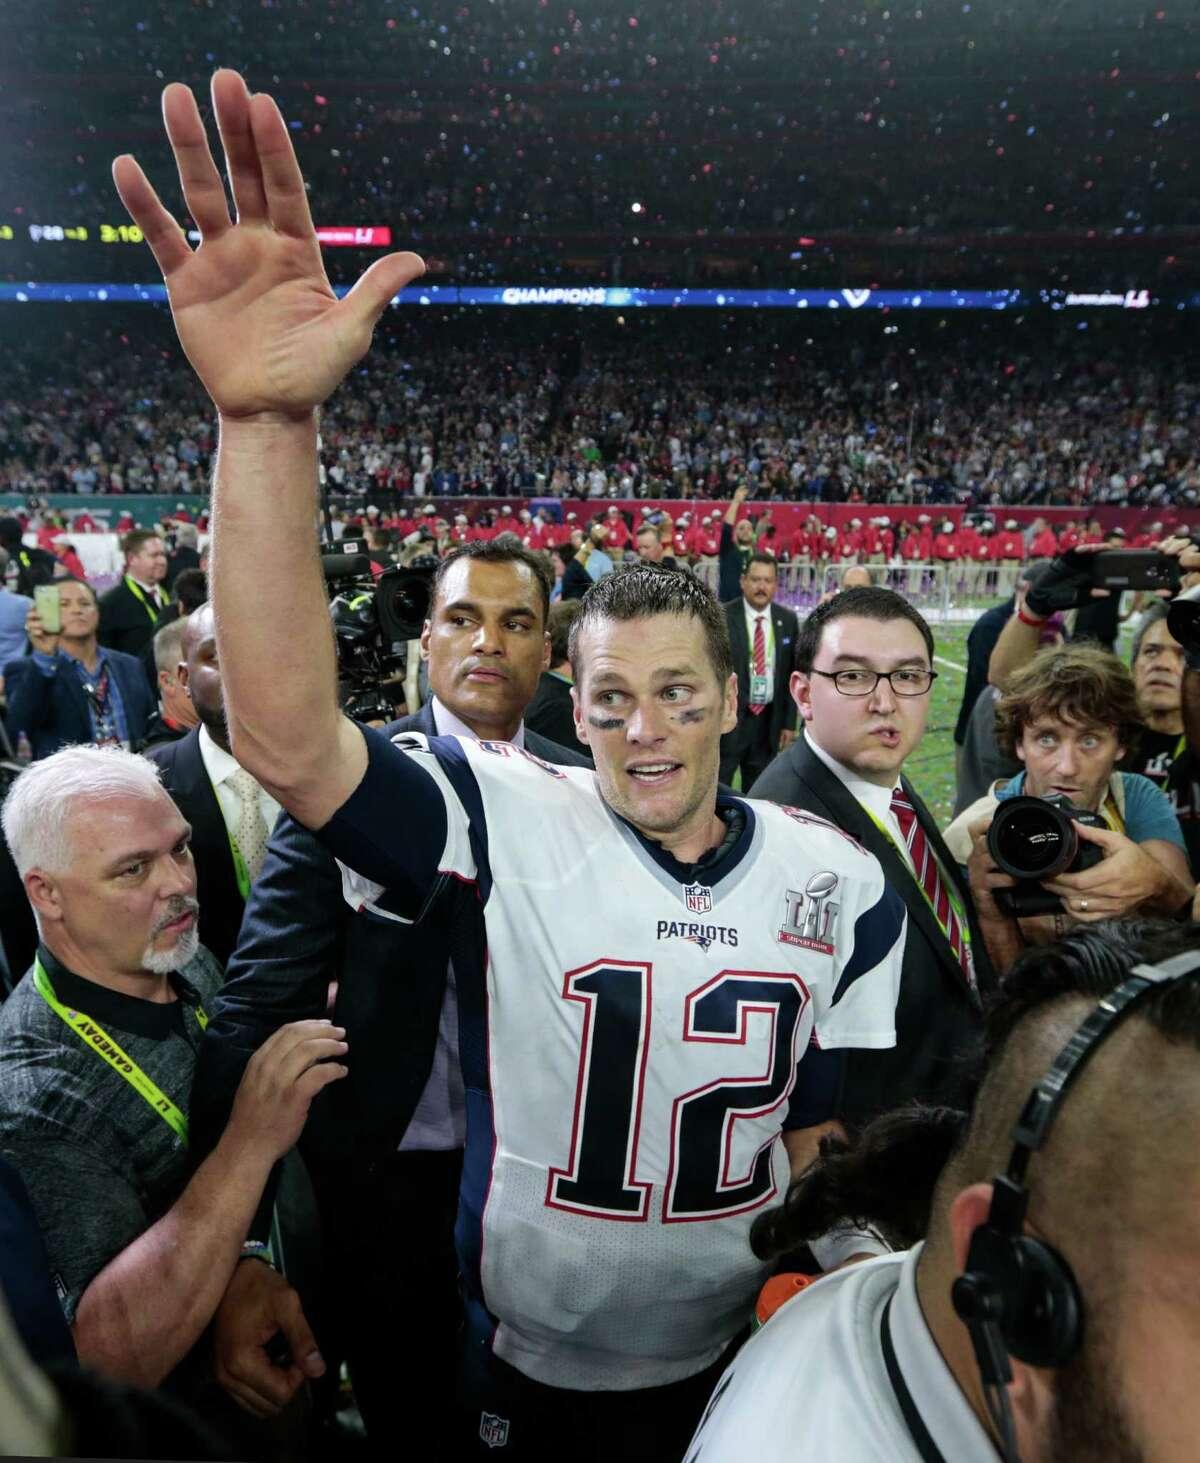 Tom Brady's Super Bowl jersey has been found after FBI help